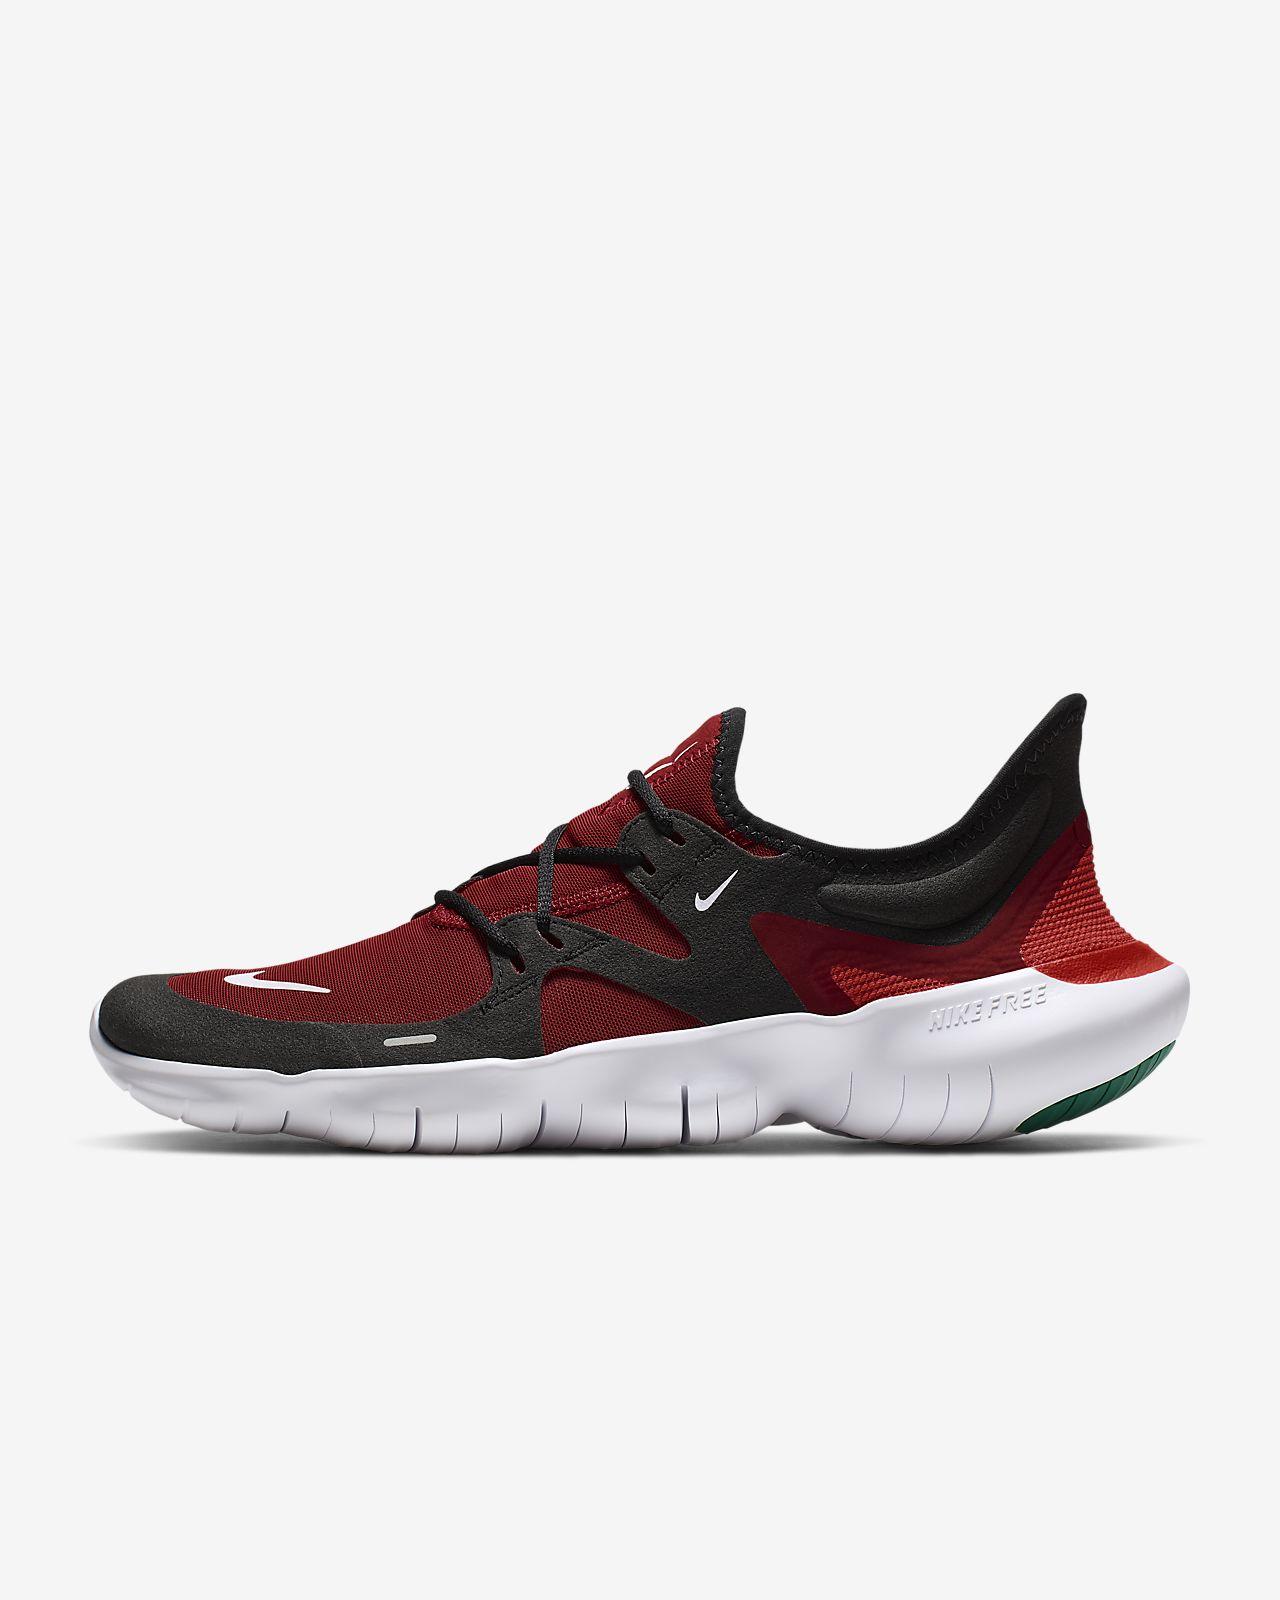 Nike Free RN 5.0 SF男/女跑步鞋